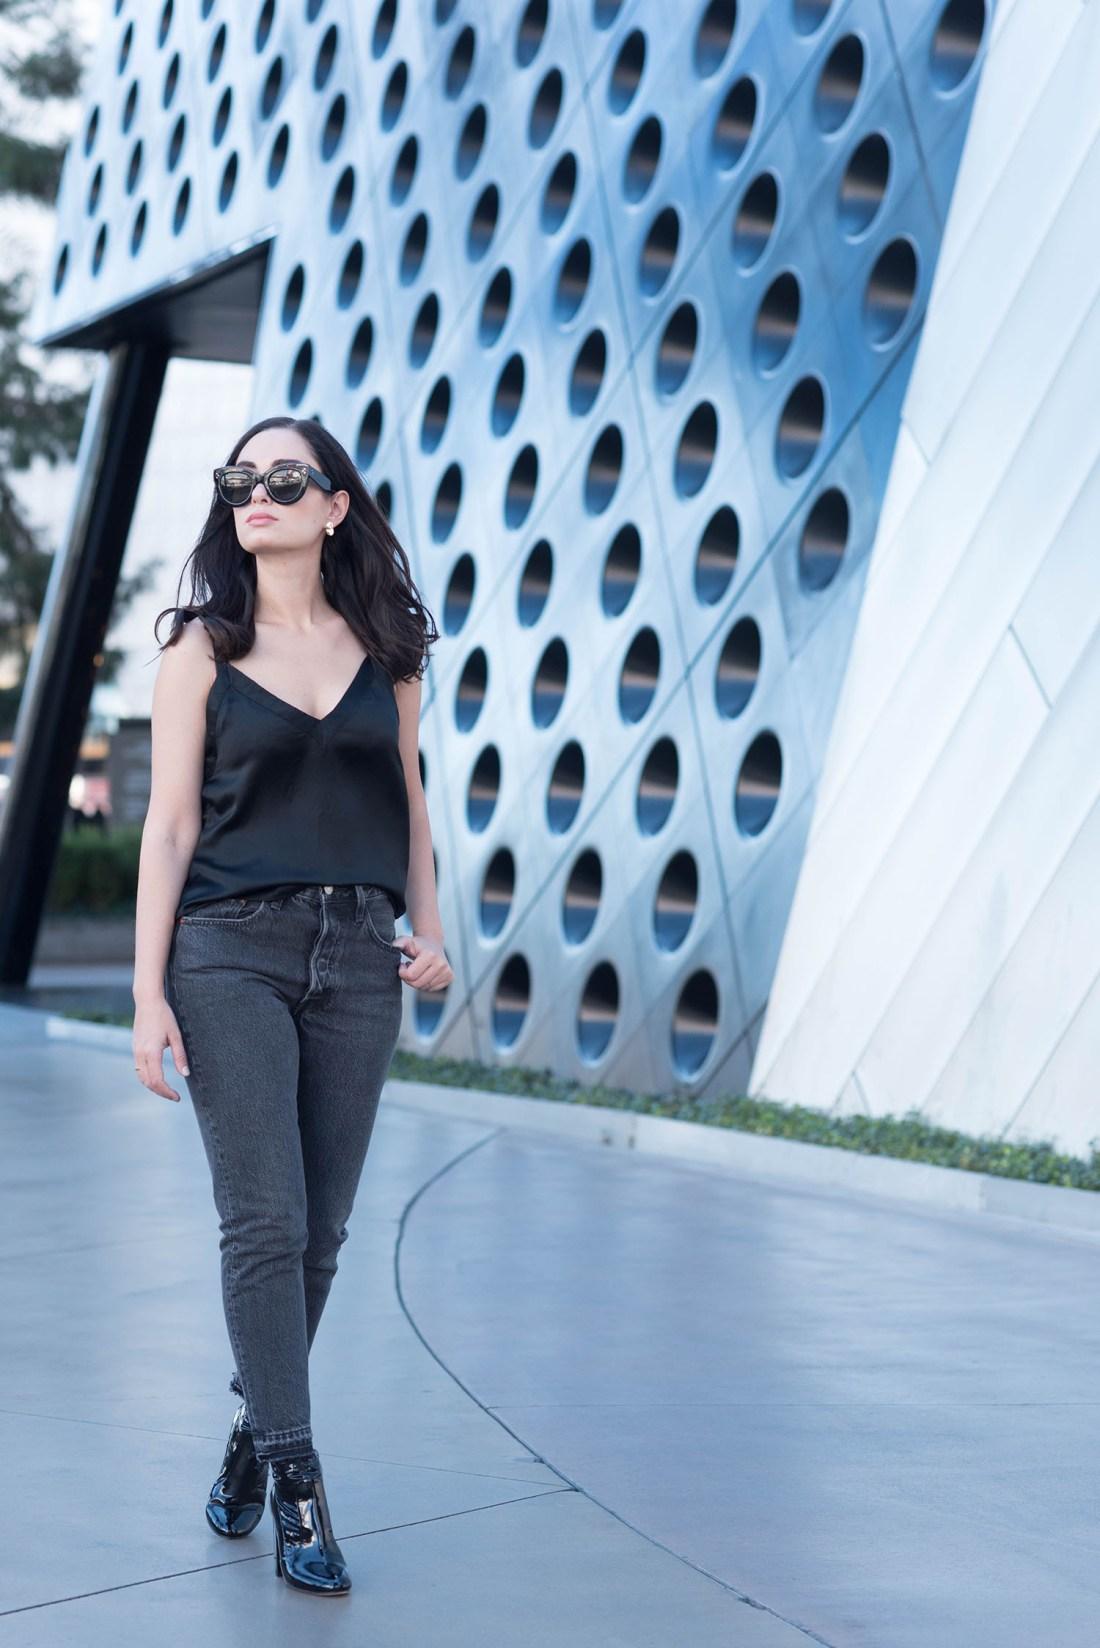 Fashion blogger Cee Fardoe of Coco & Vera walks in Las Vegas wears Levis 501 skinny jeans and Raye black patent boots